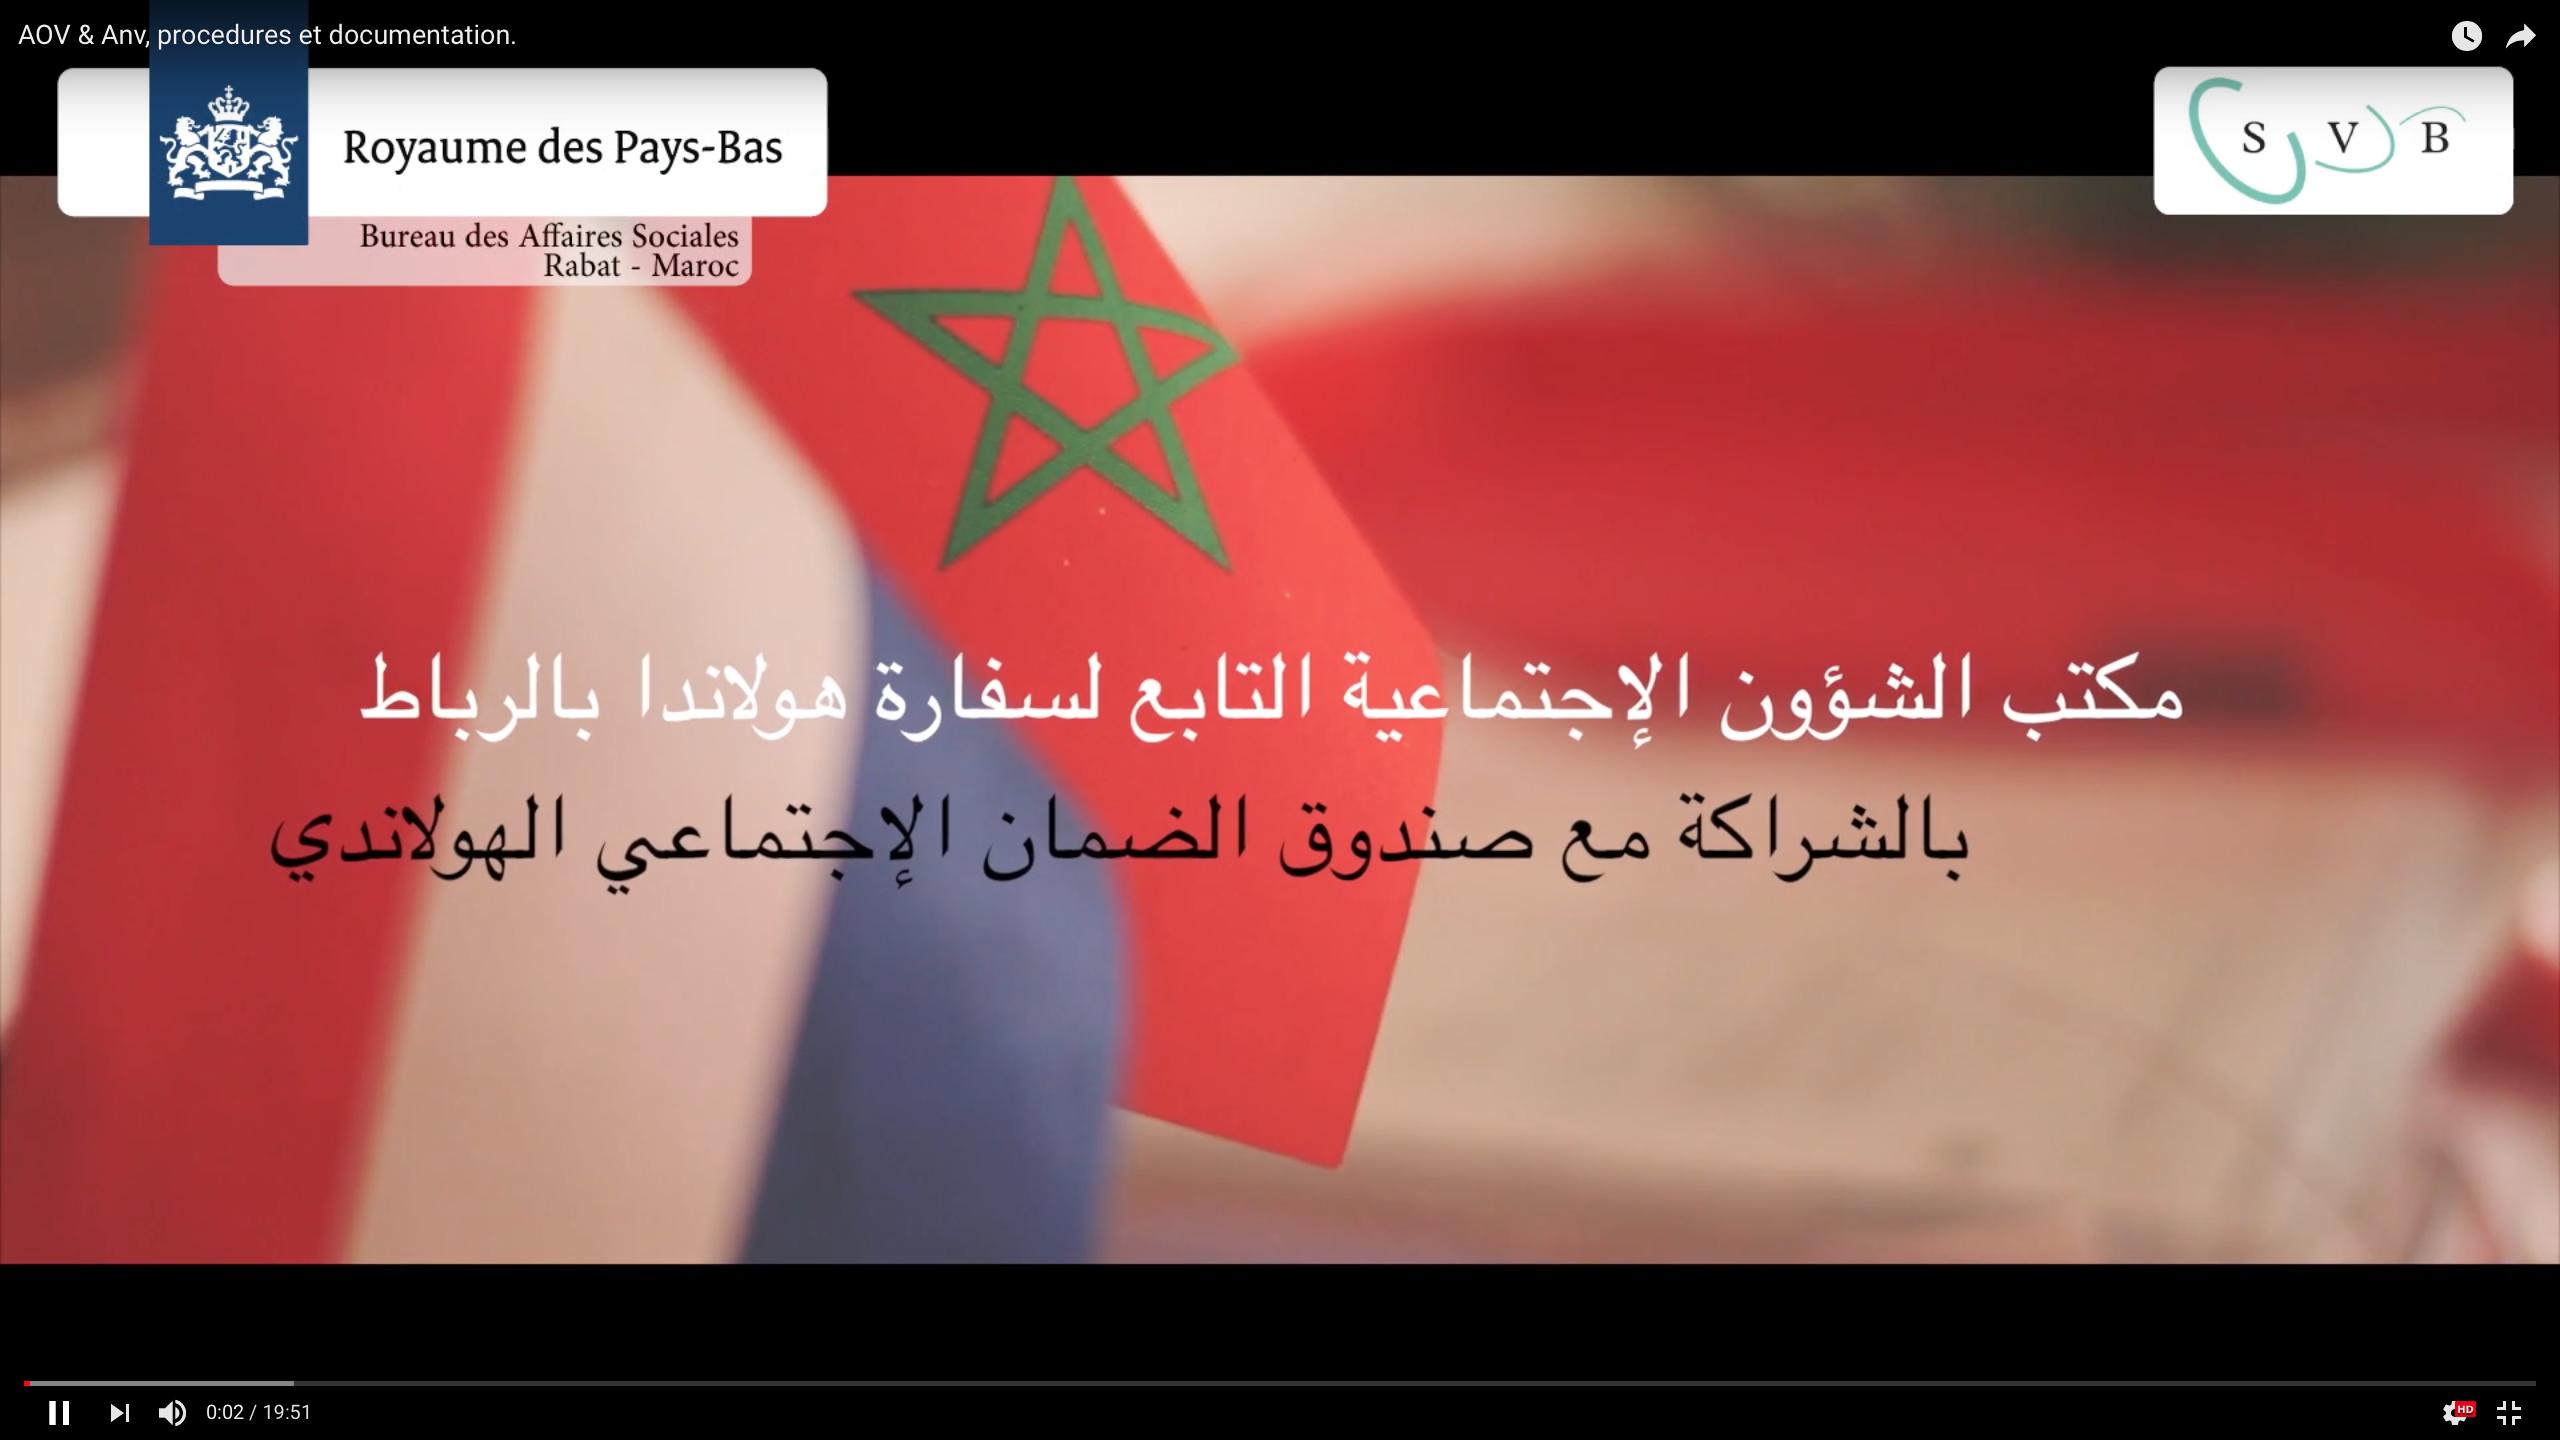 Ambassade des Pays Bas au Maroc